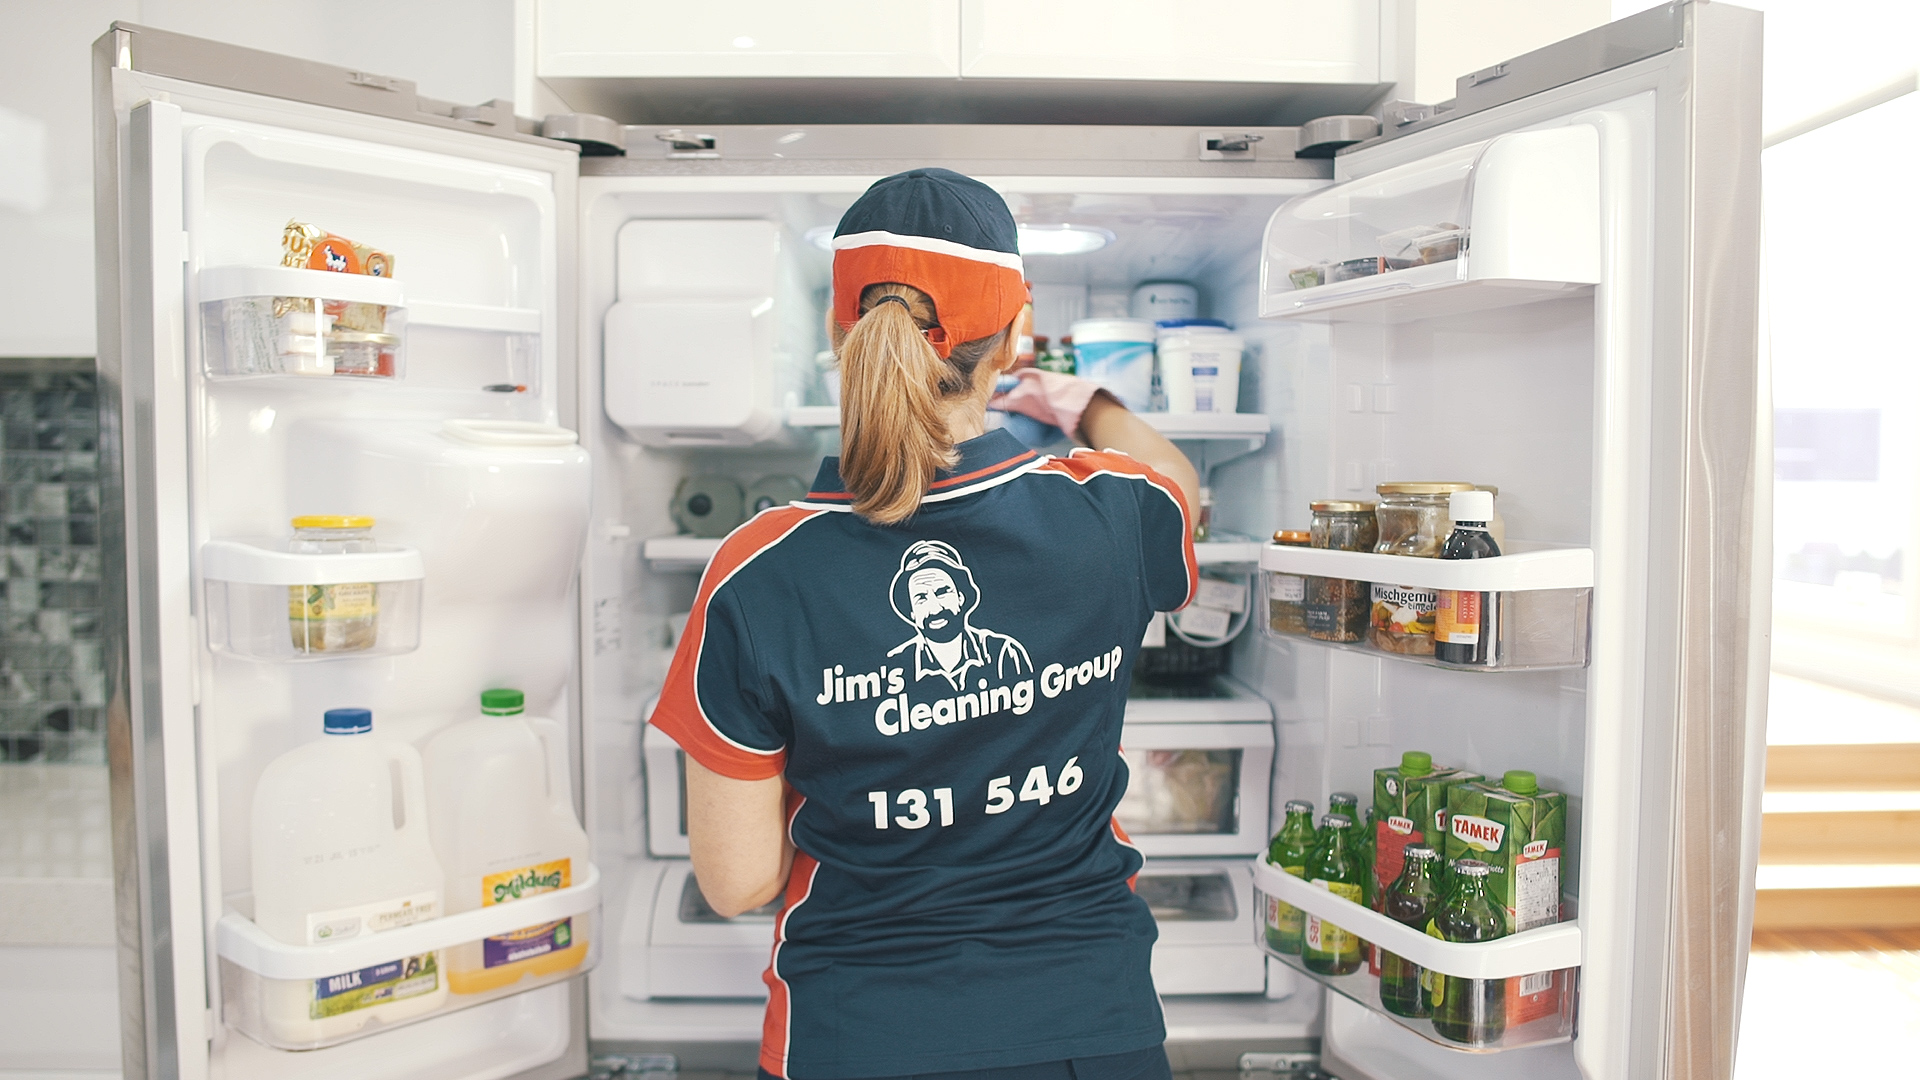 Jim's Cleaning St Kilda South - St Kilda East, VIC 3183 - (01) 3154 1546 | ShowMeLocal.com